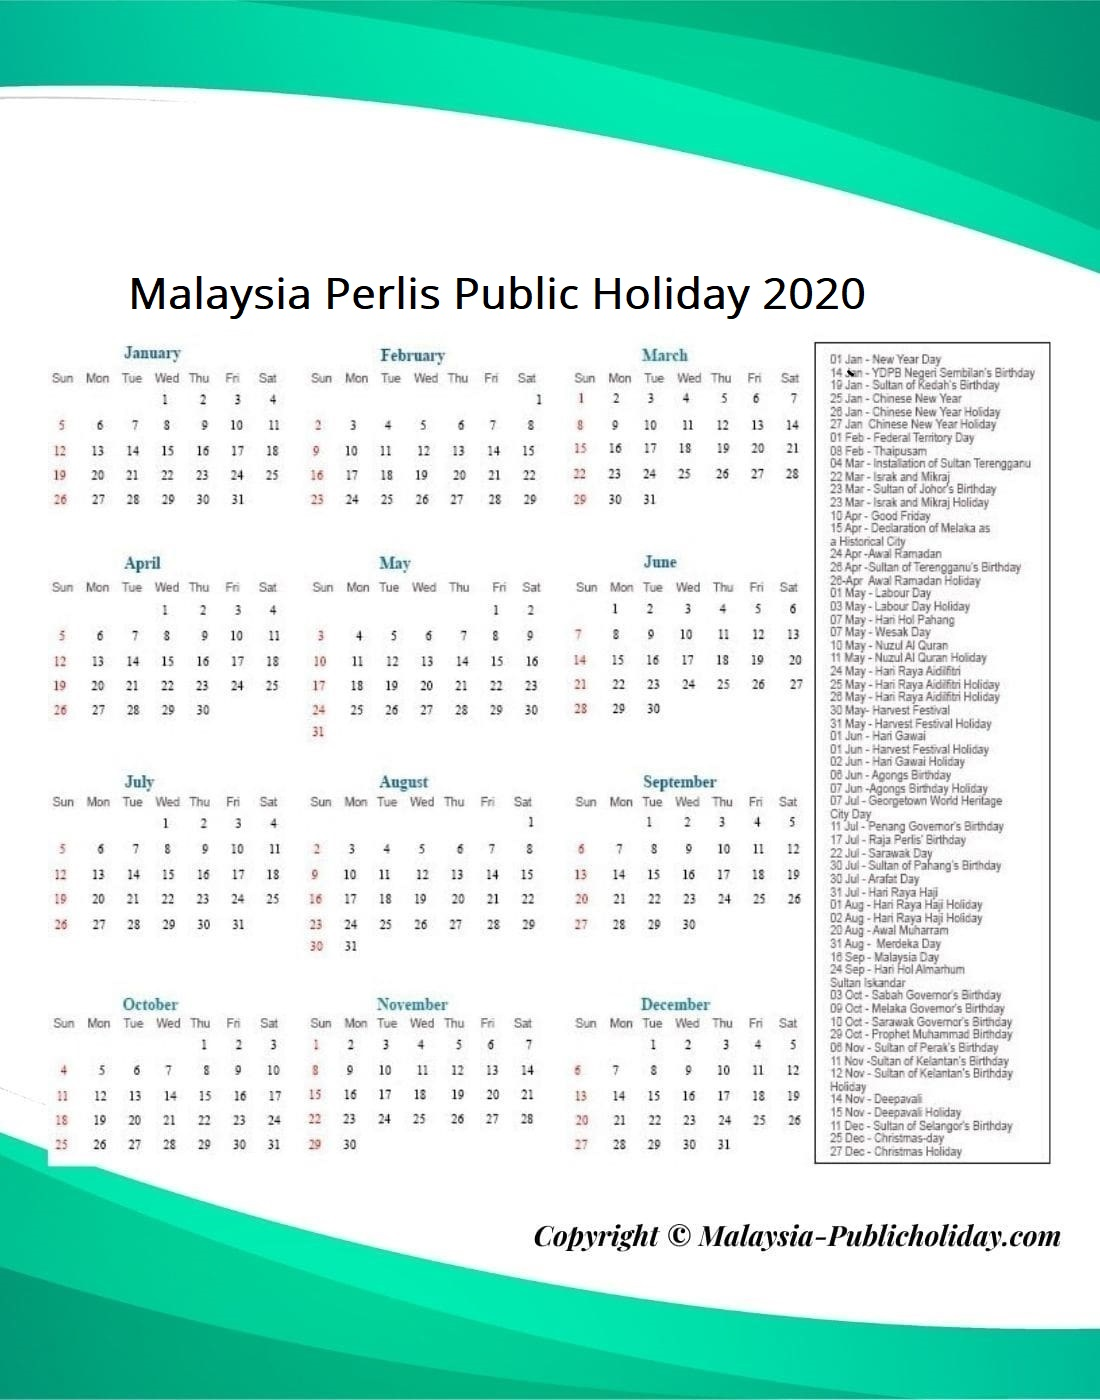 Perlis Public Holiday 2020